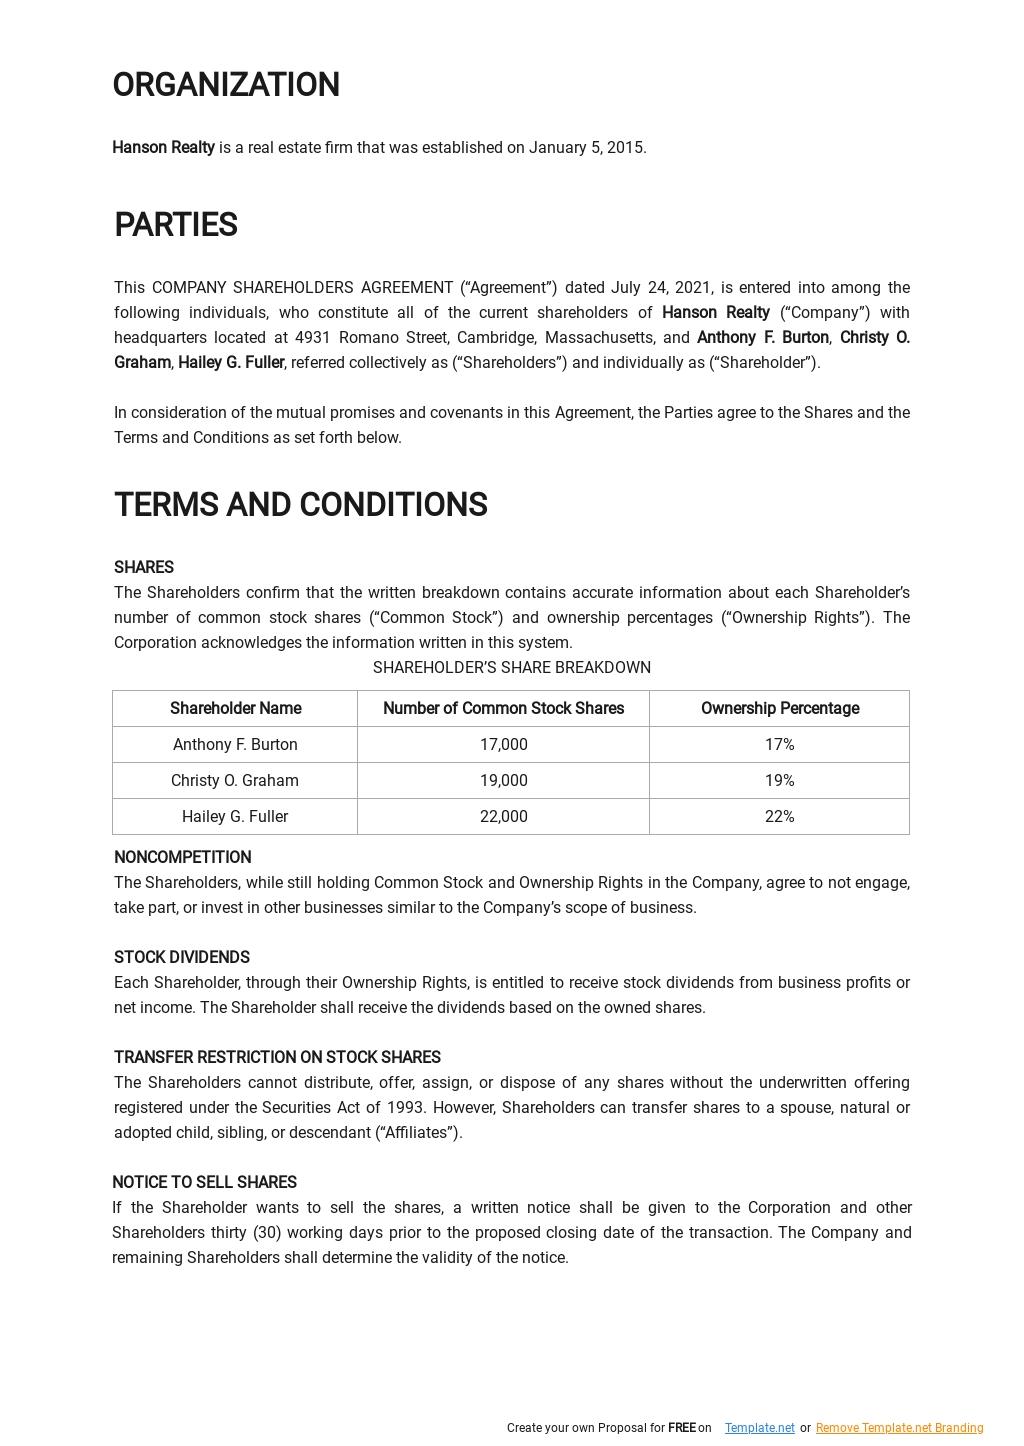 Company Shareholders Agreement Template 1.jpe